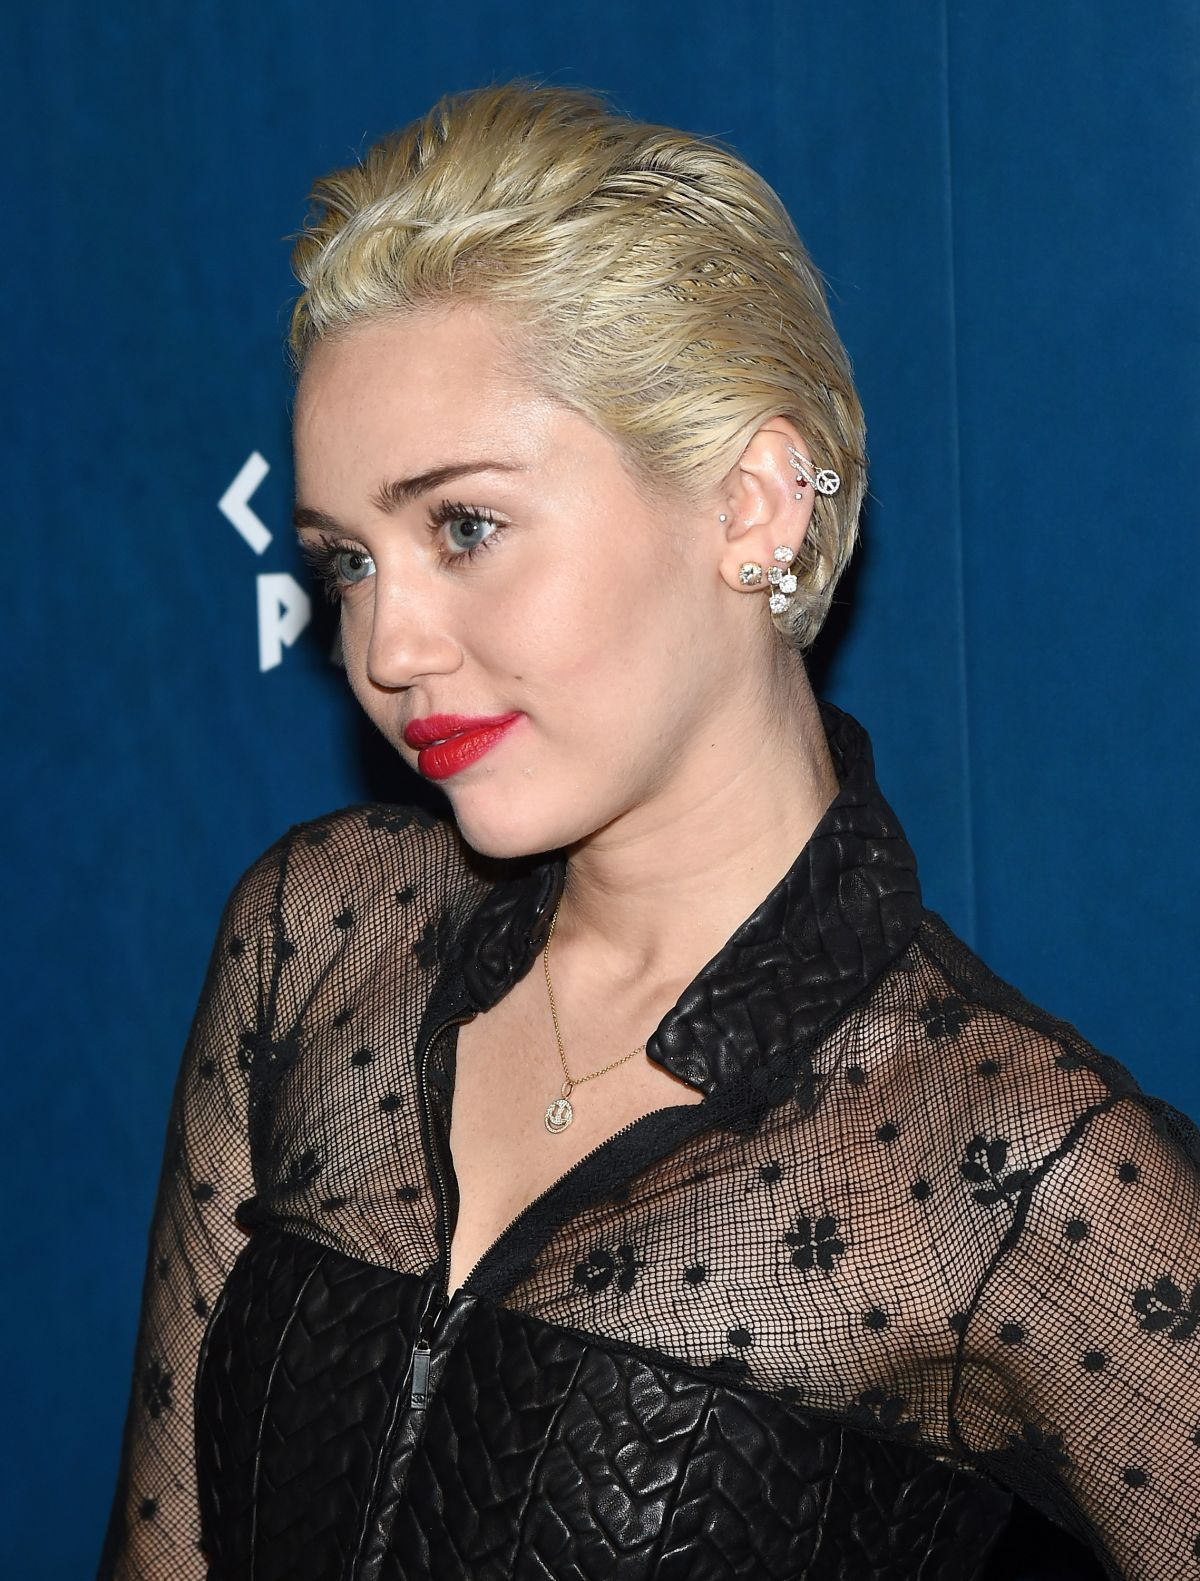 MILEY CYRUS at Omnia Nightclub at Caesars Palace in Las ... Miley Cyrus